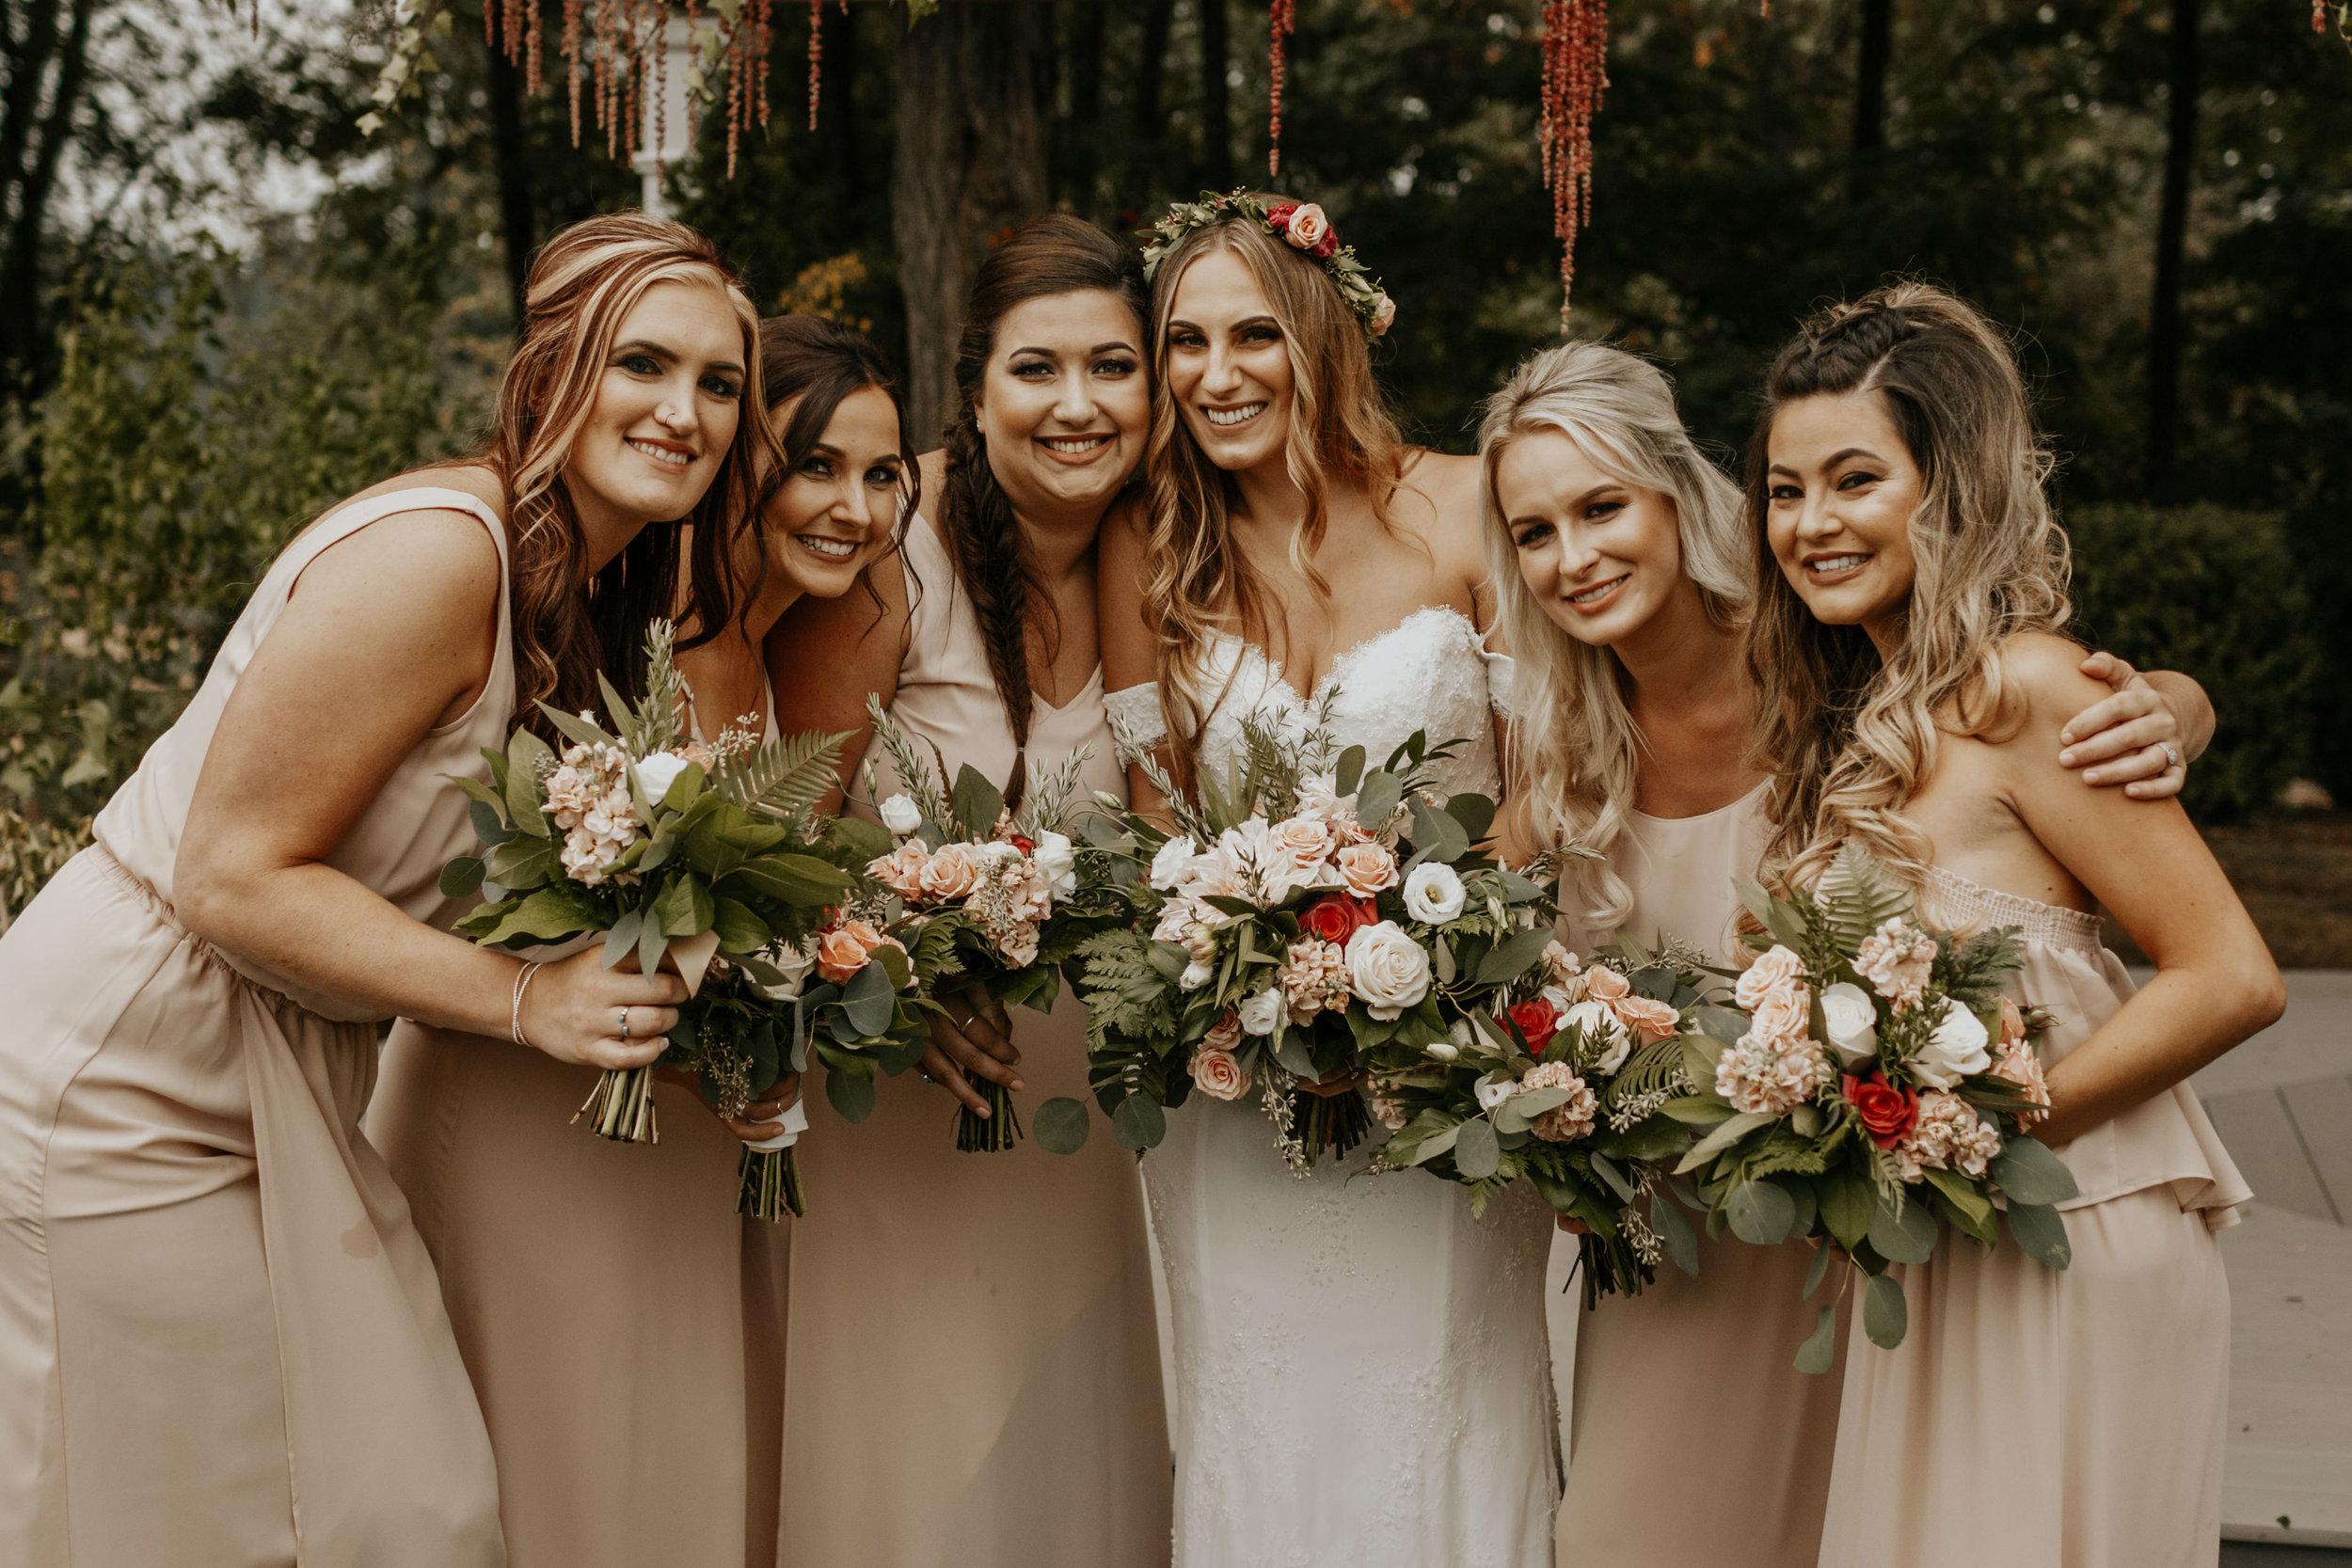 ginapaulson_jakitrevor_wedding-399.jpg